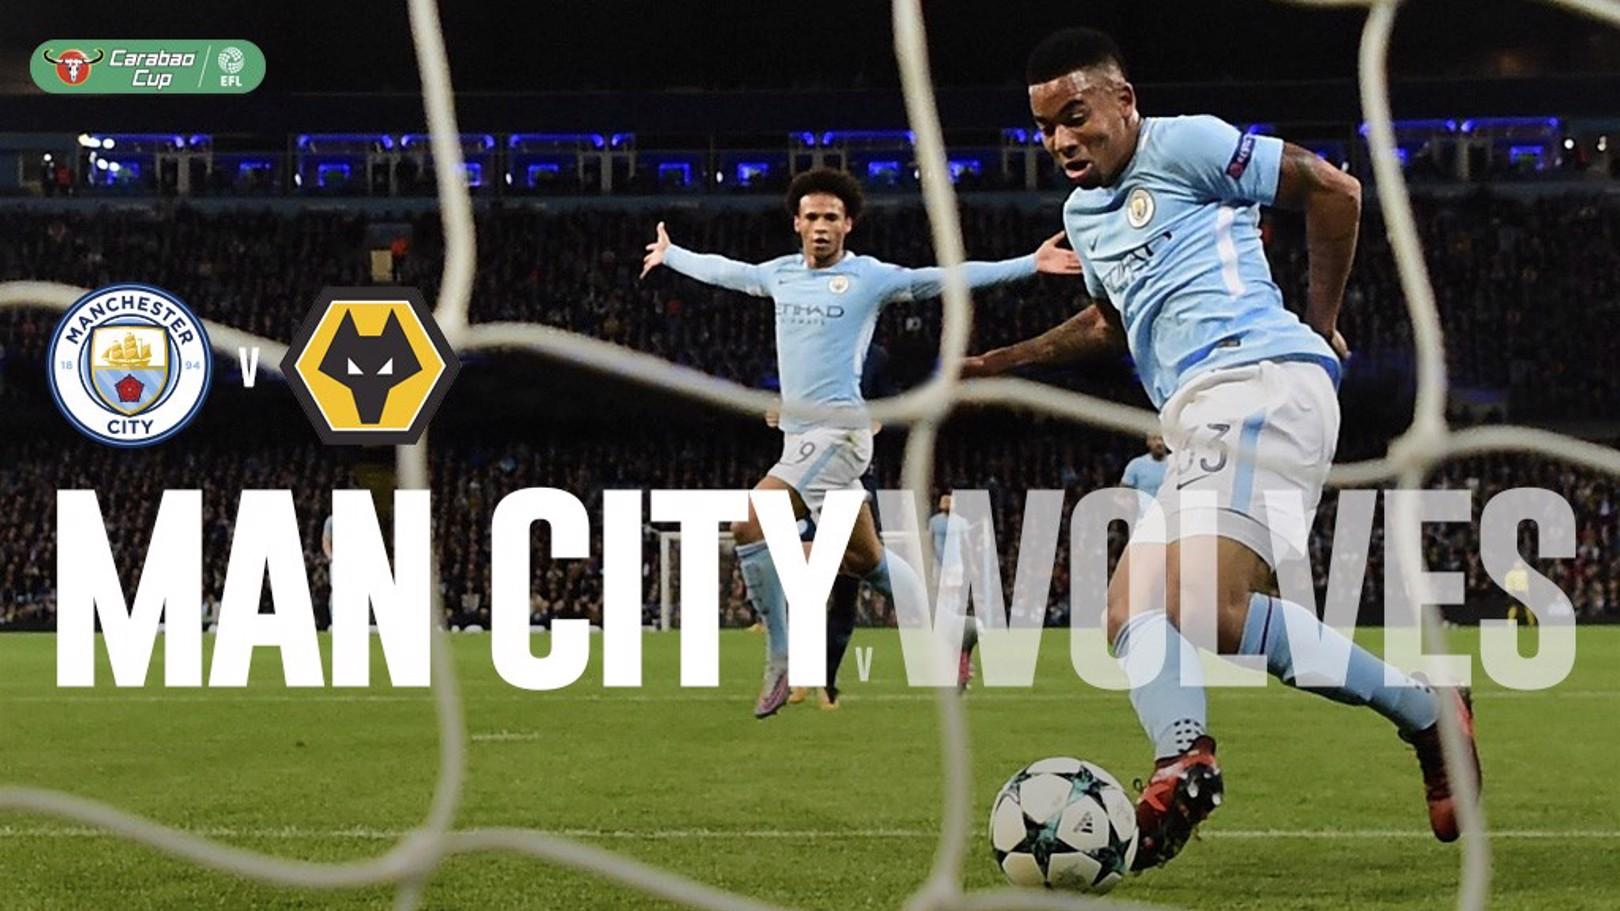 Man City vs Wolves: Relato da Partida